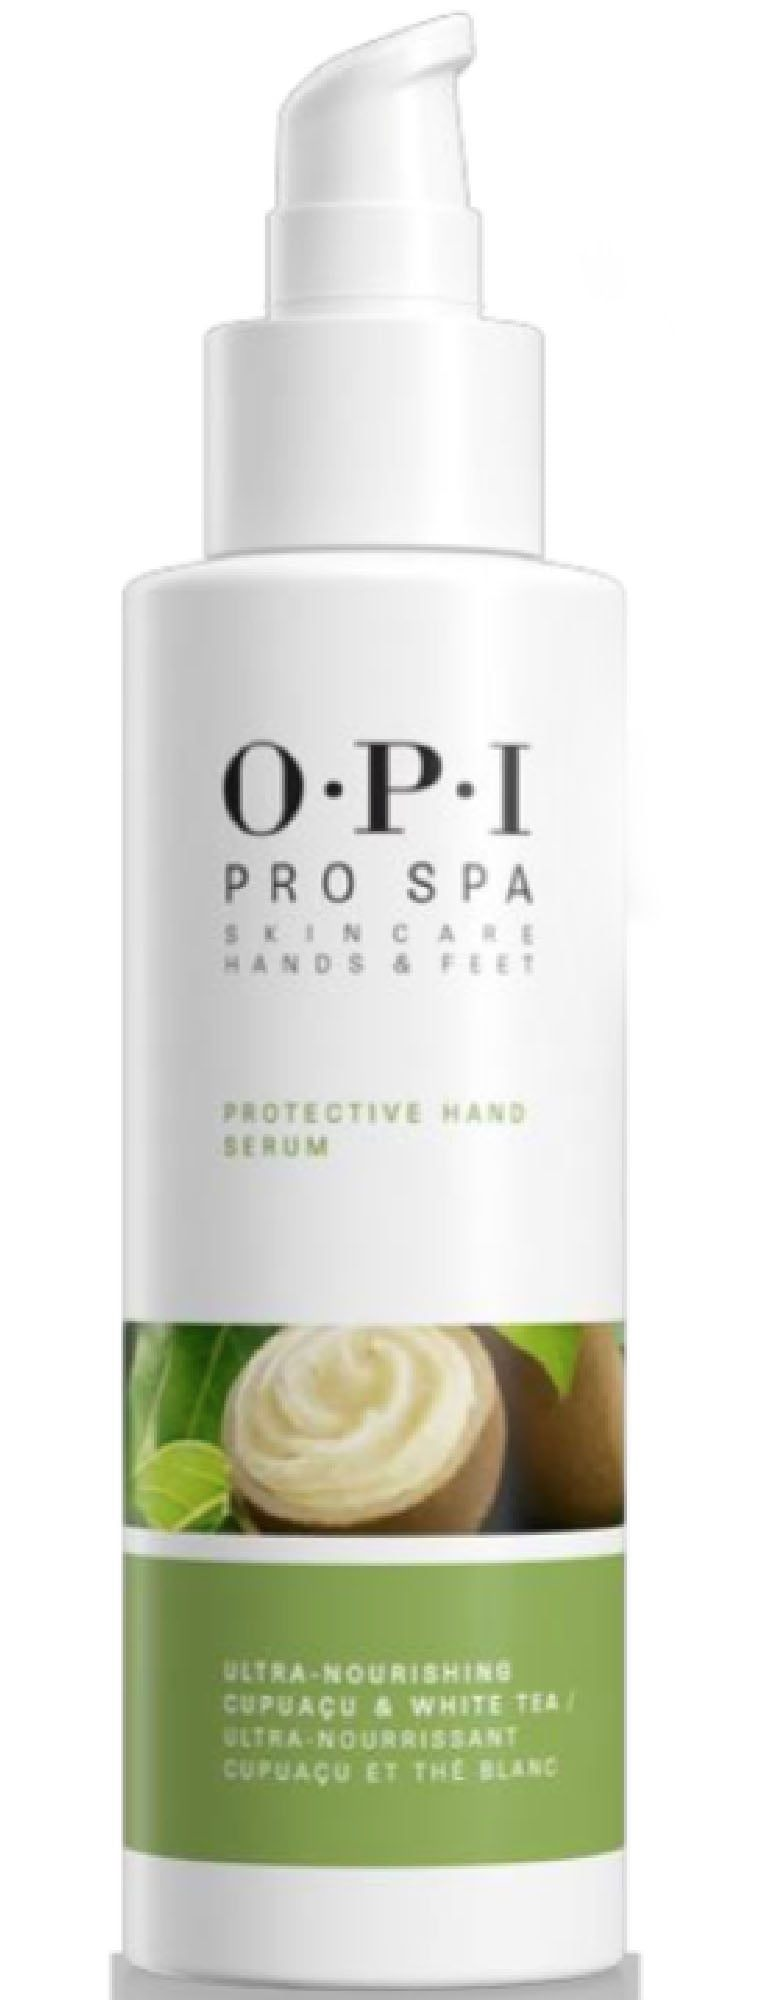 OPI Сыворотка защитная для рук / PRO SPA 225мл opi лосьон для рук и тела opi avoplex moisture replenishing lotion av711 30 мл